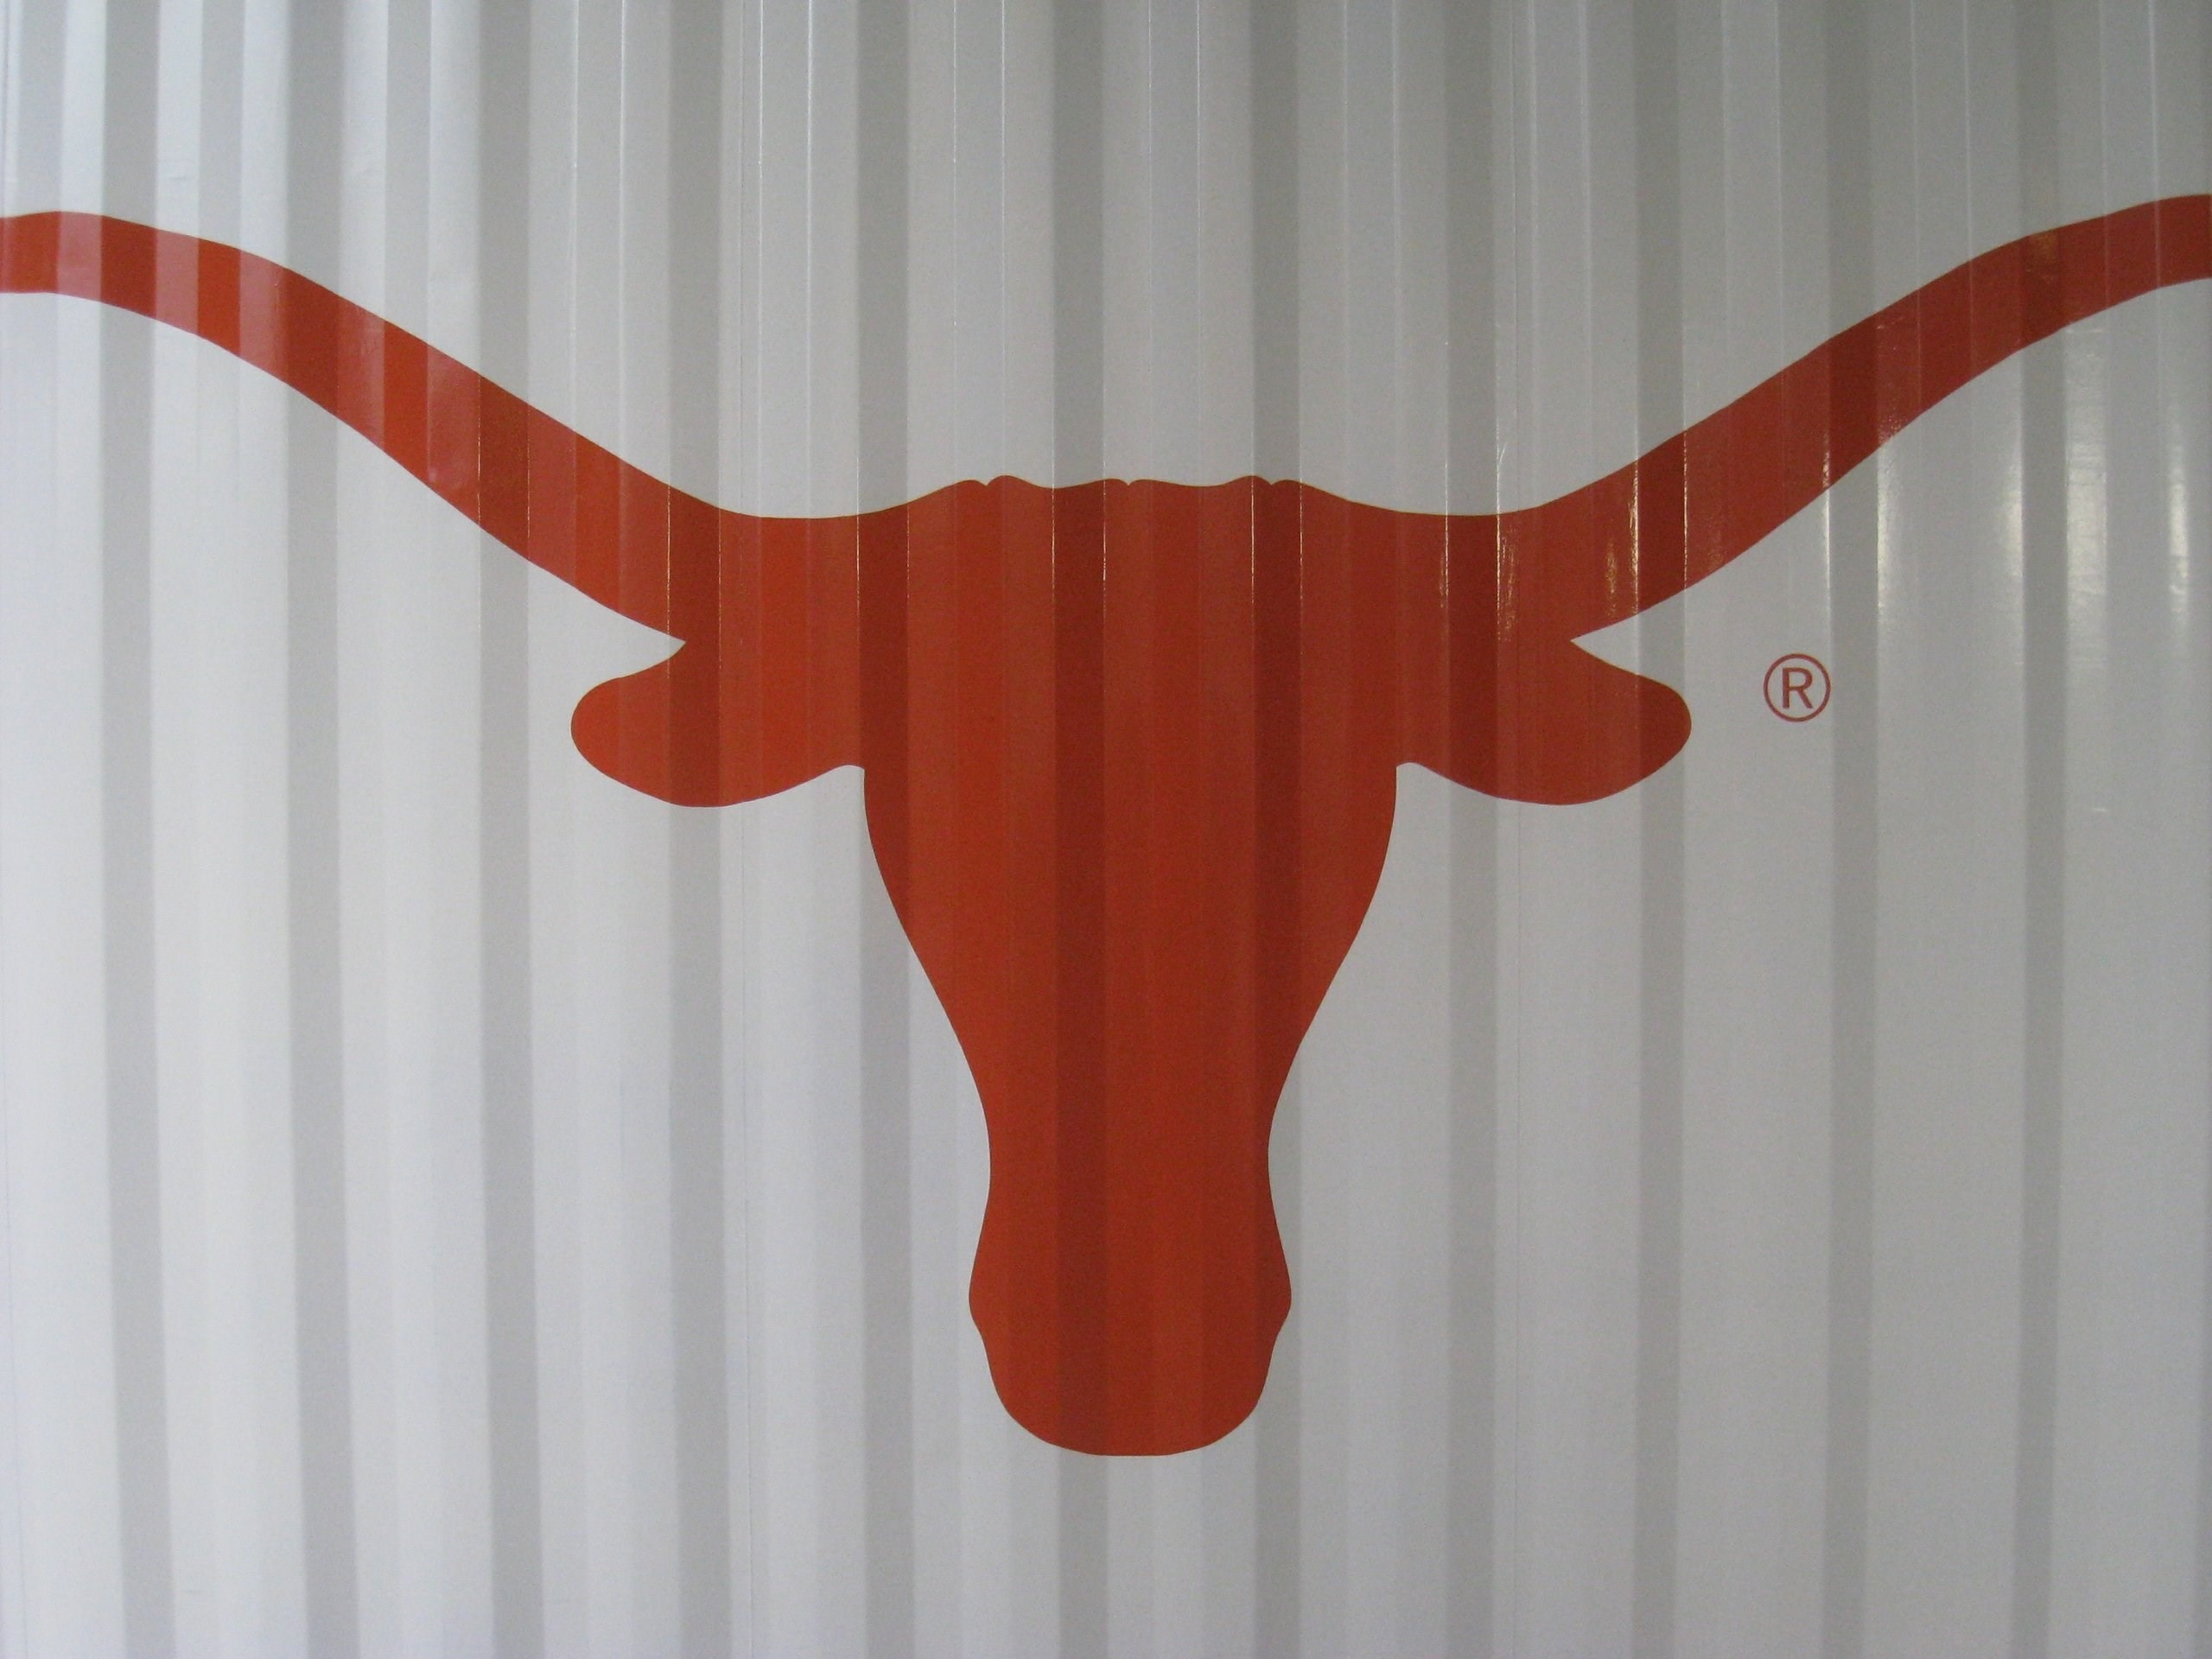 hd texas longhorns football wallpaper   ololoshka   Pinterest   Football  wallpaper, Texas longhorns and Texas